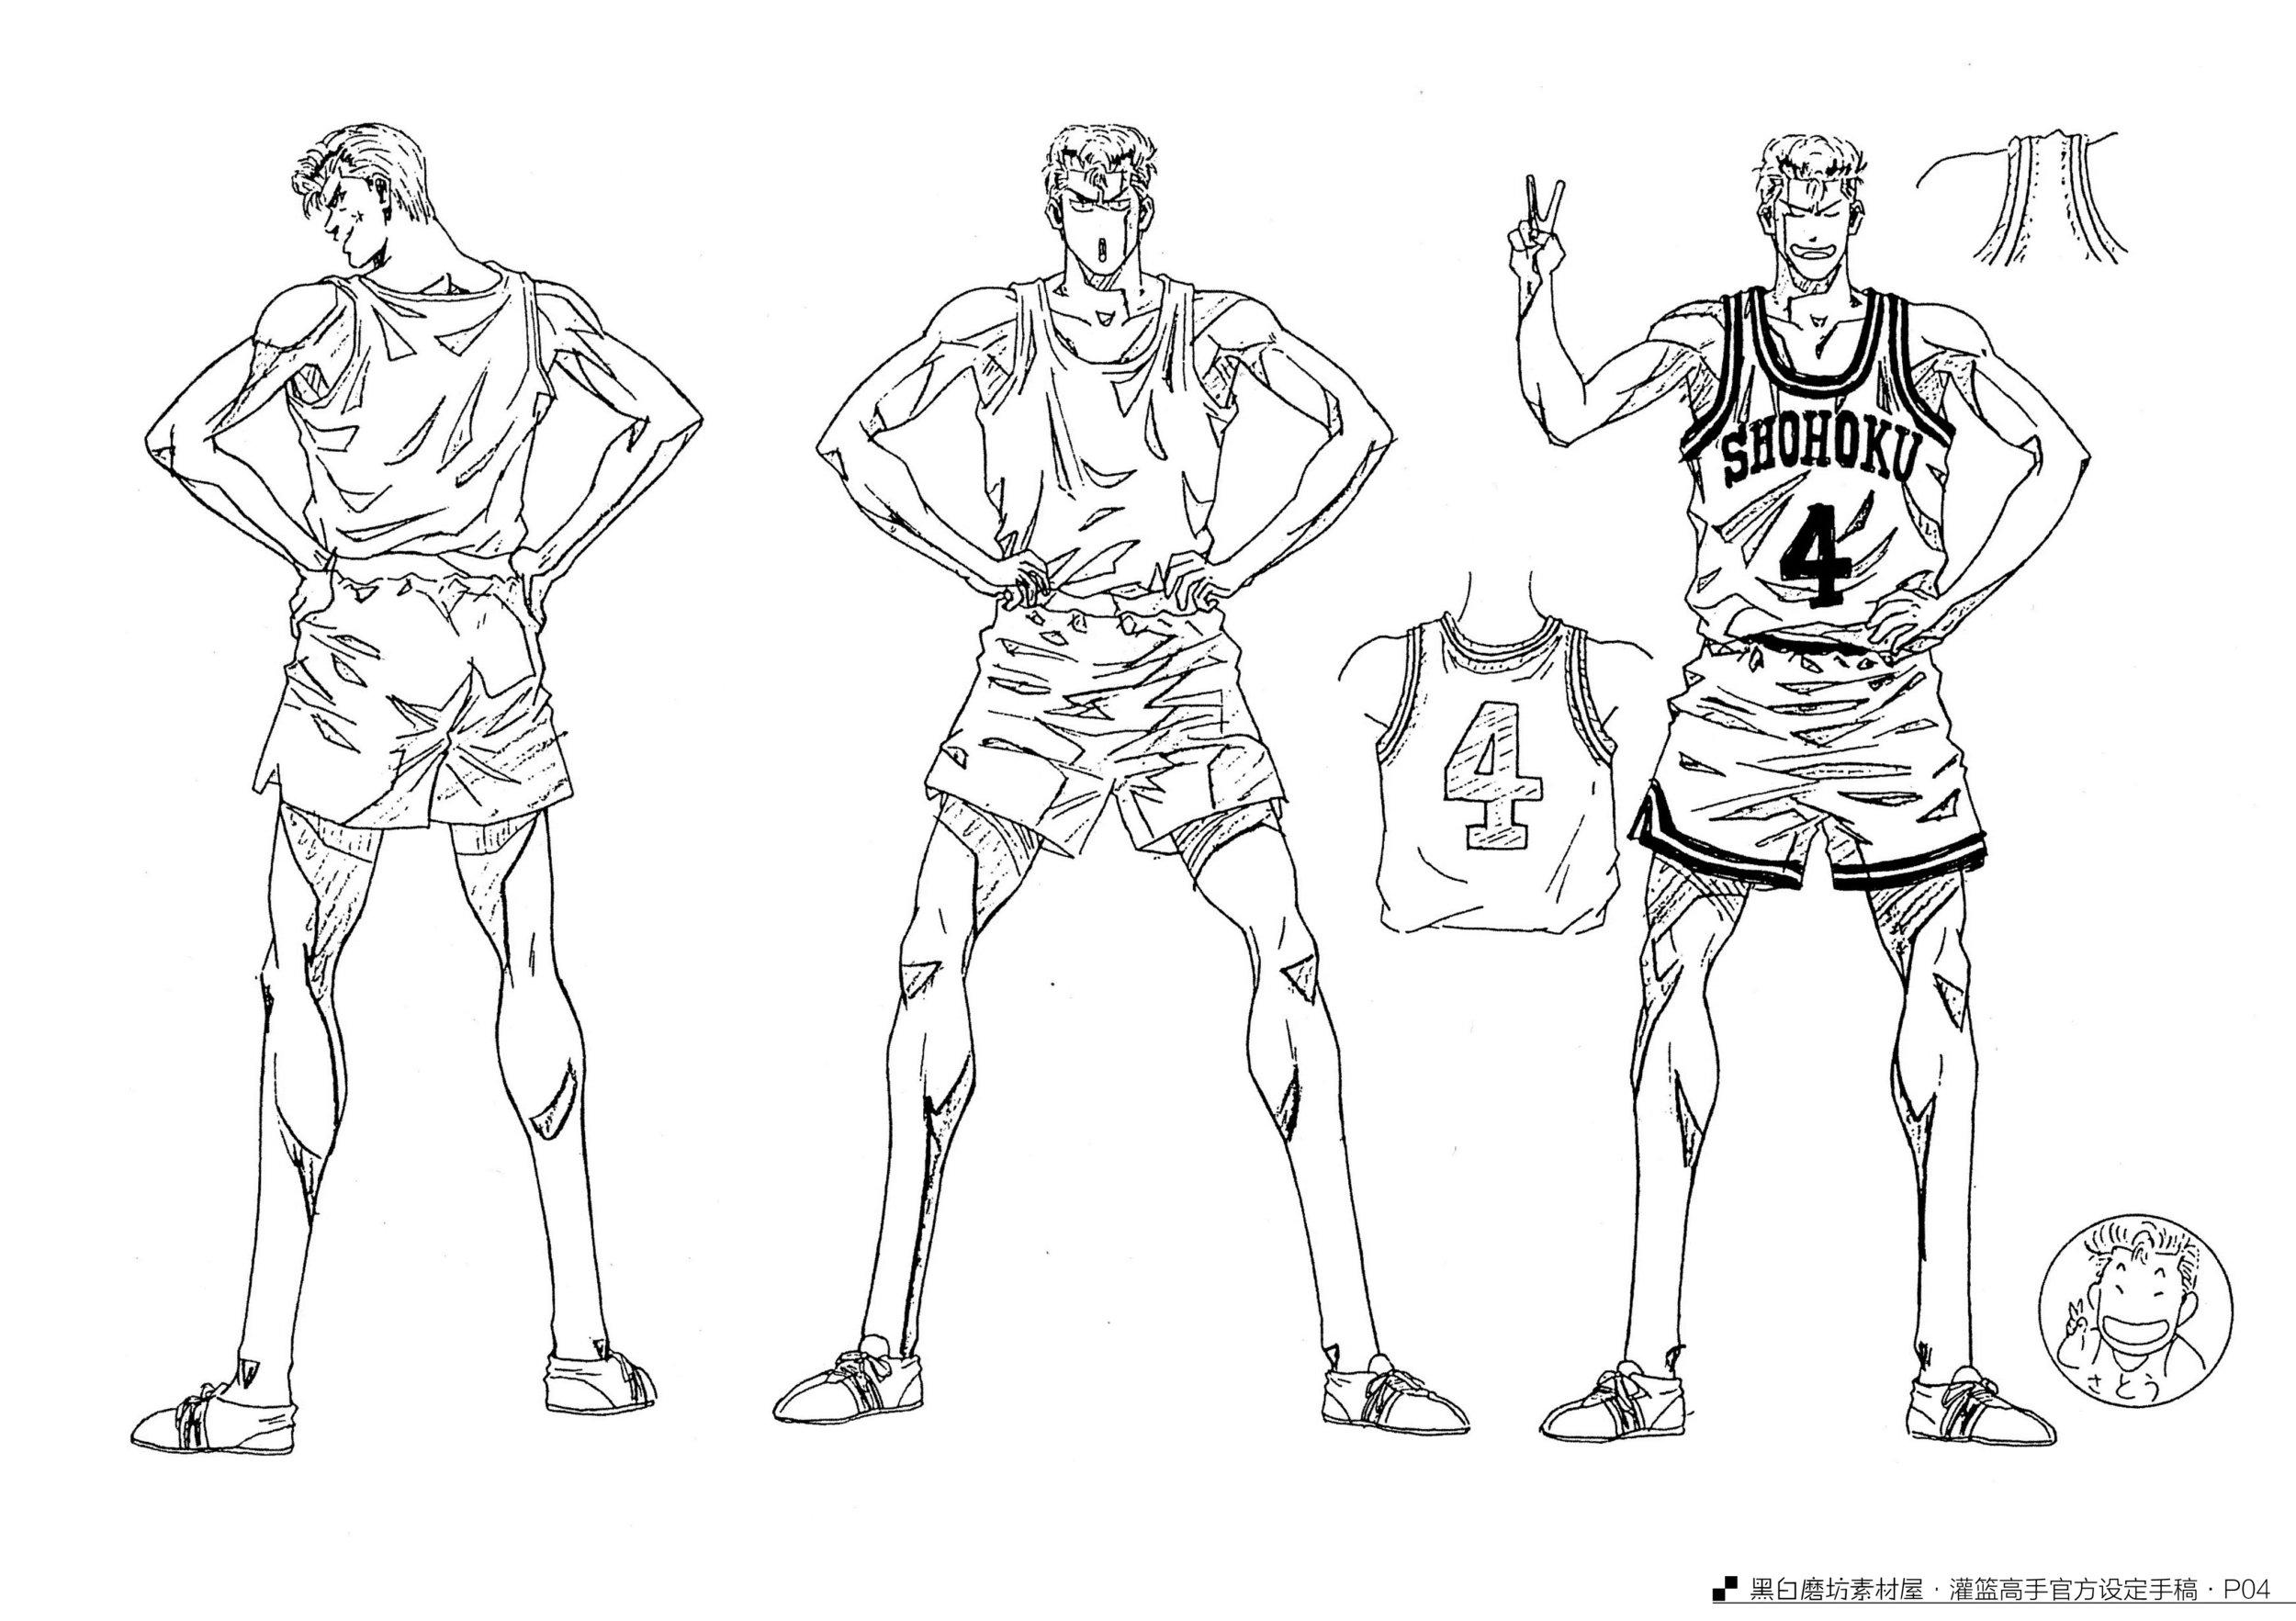 Art of the Slam Dunk A - 3.jpg